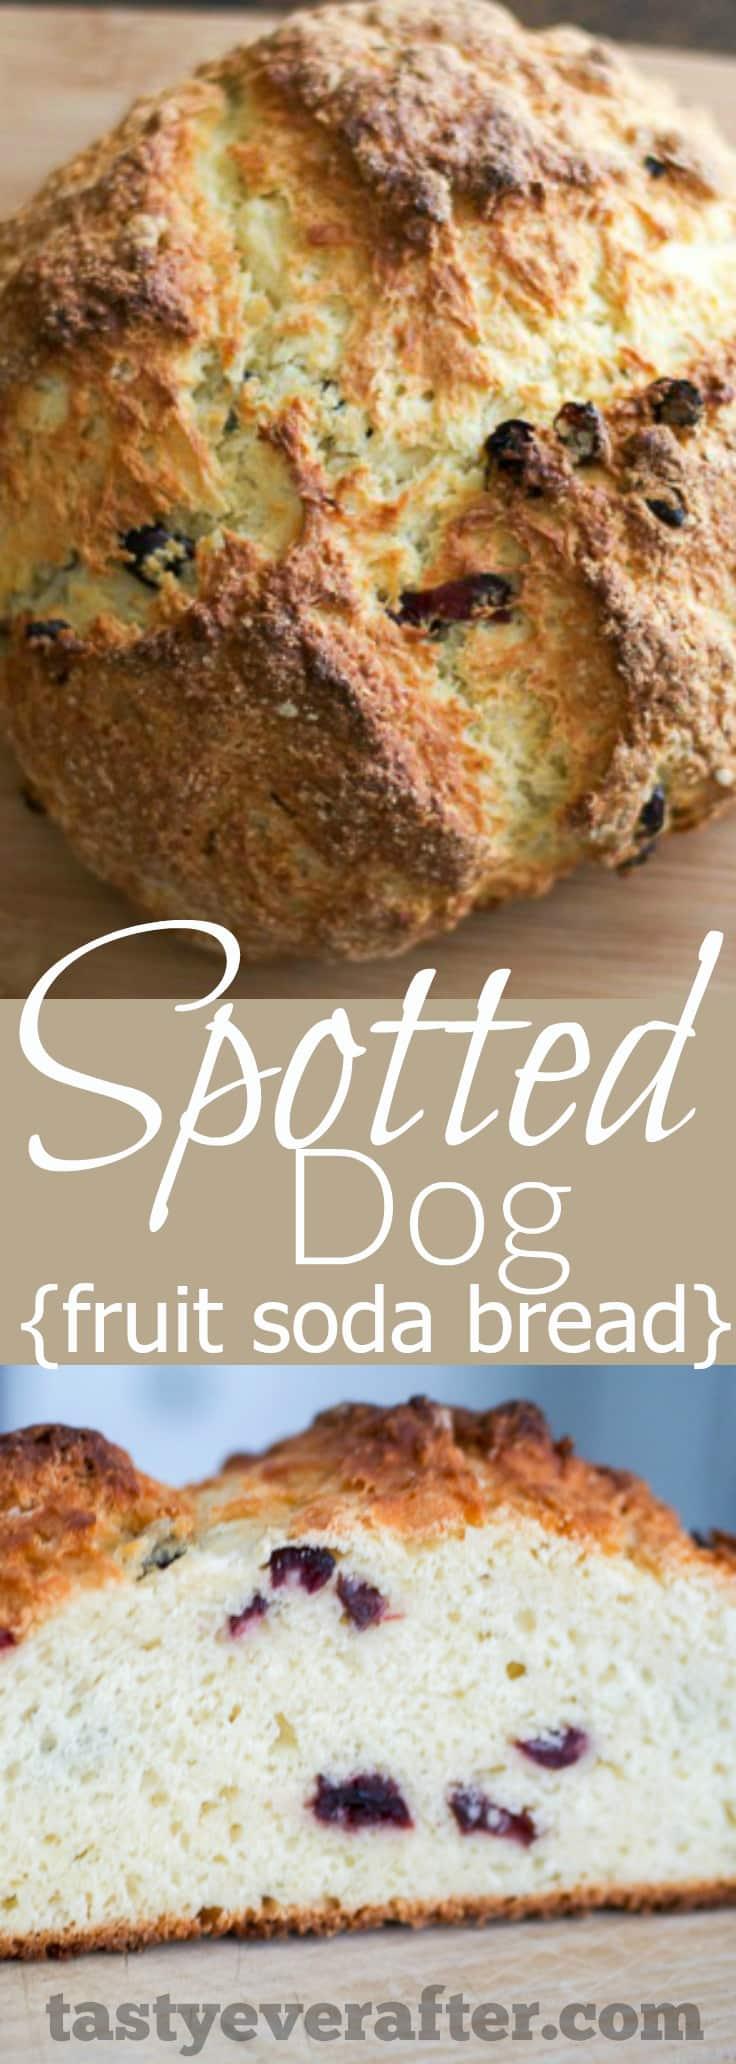 Irish Spotted Dog